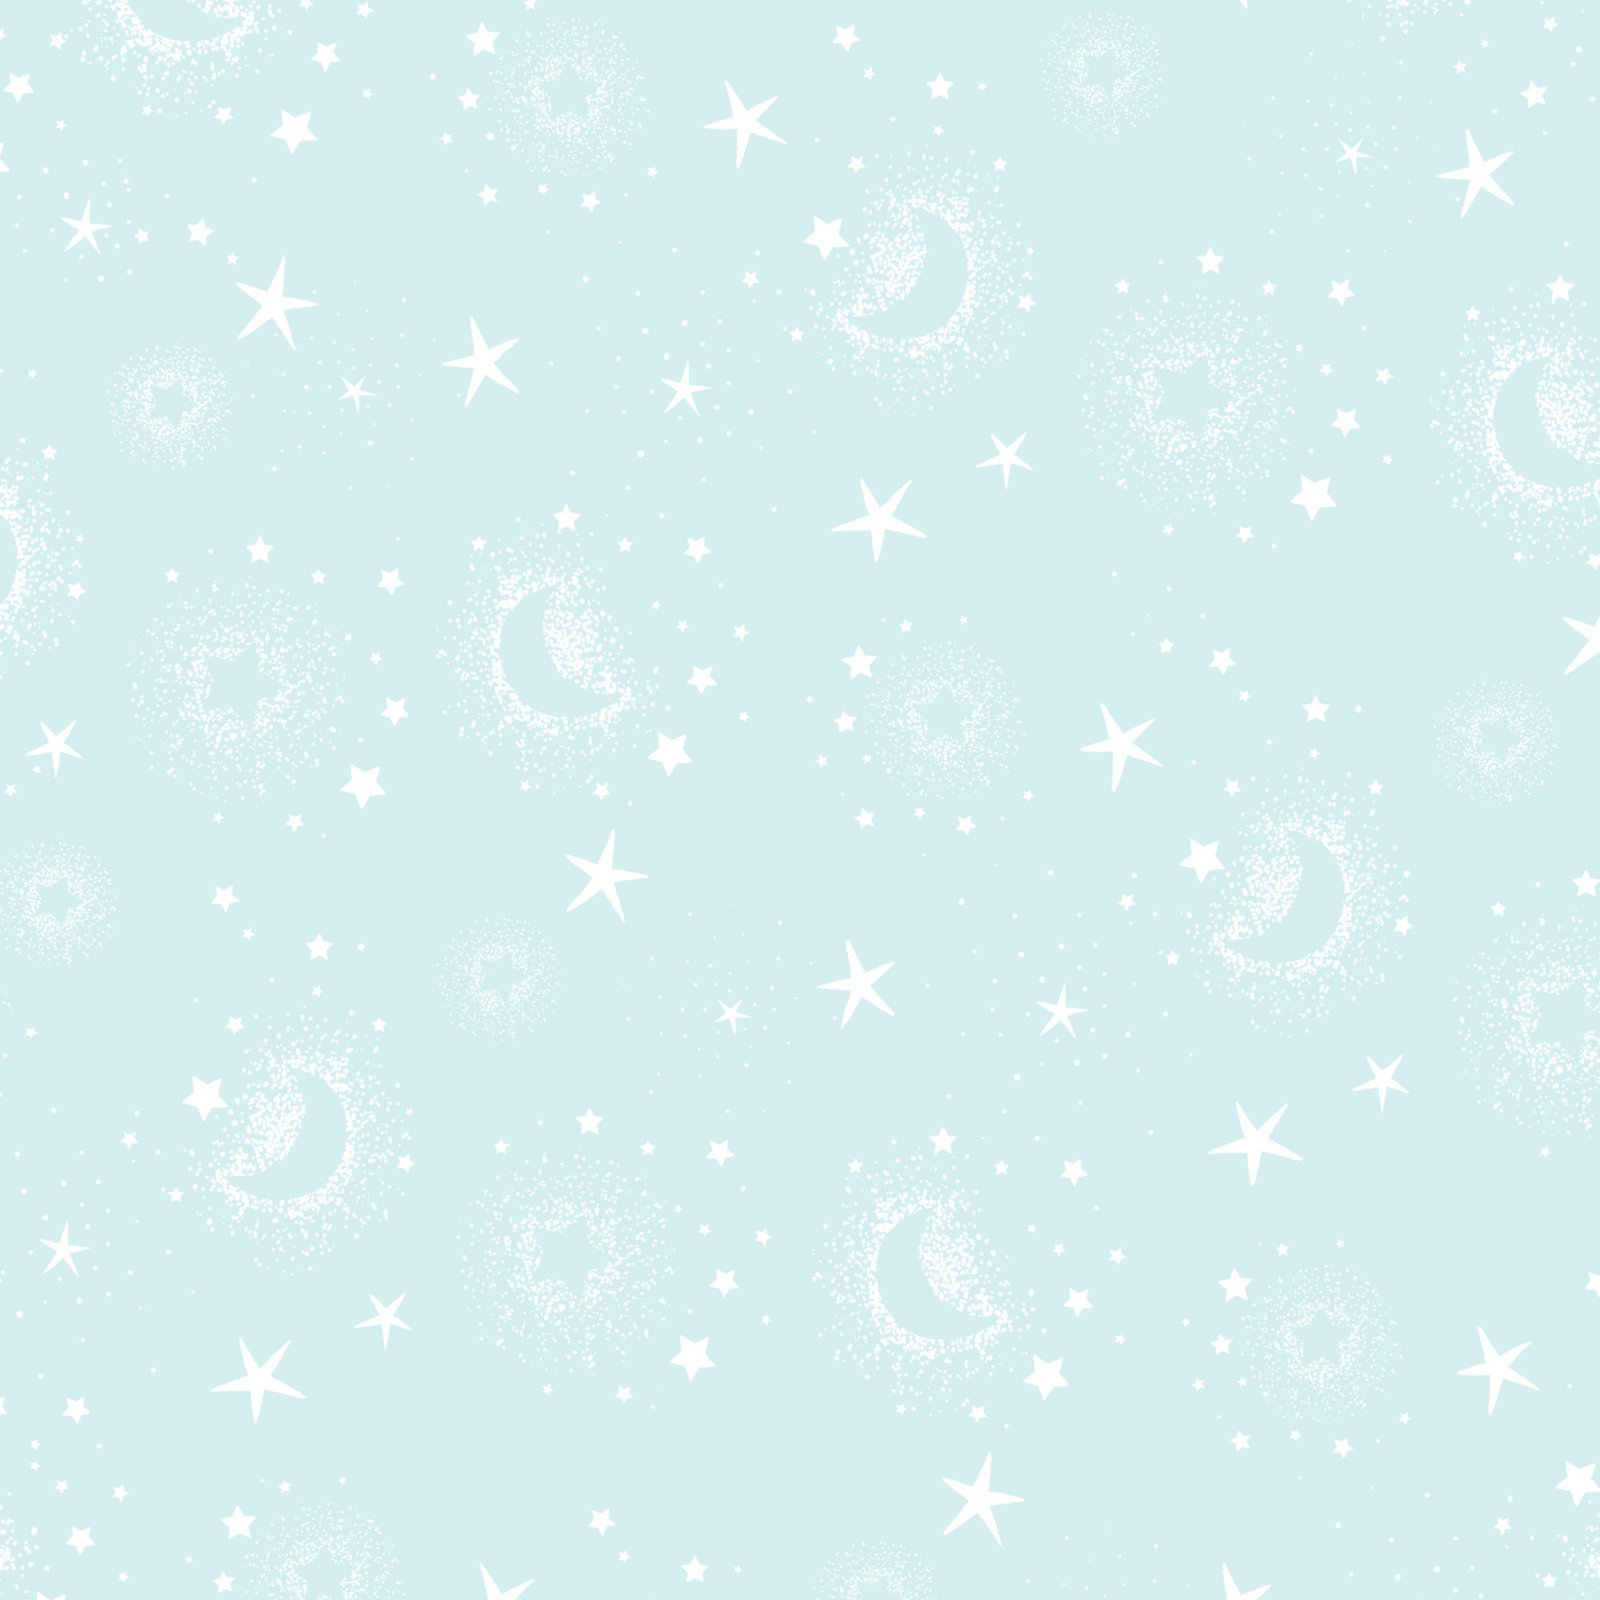 SBRI-4600 LT - STAR BRIGHT BY JENNIFER ELLORY TONE ON TONE LT TEAL/TURQUOISE - ARRIVING IN JANUARY 2022